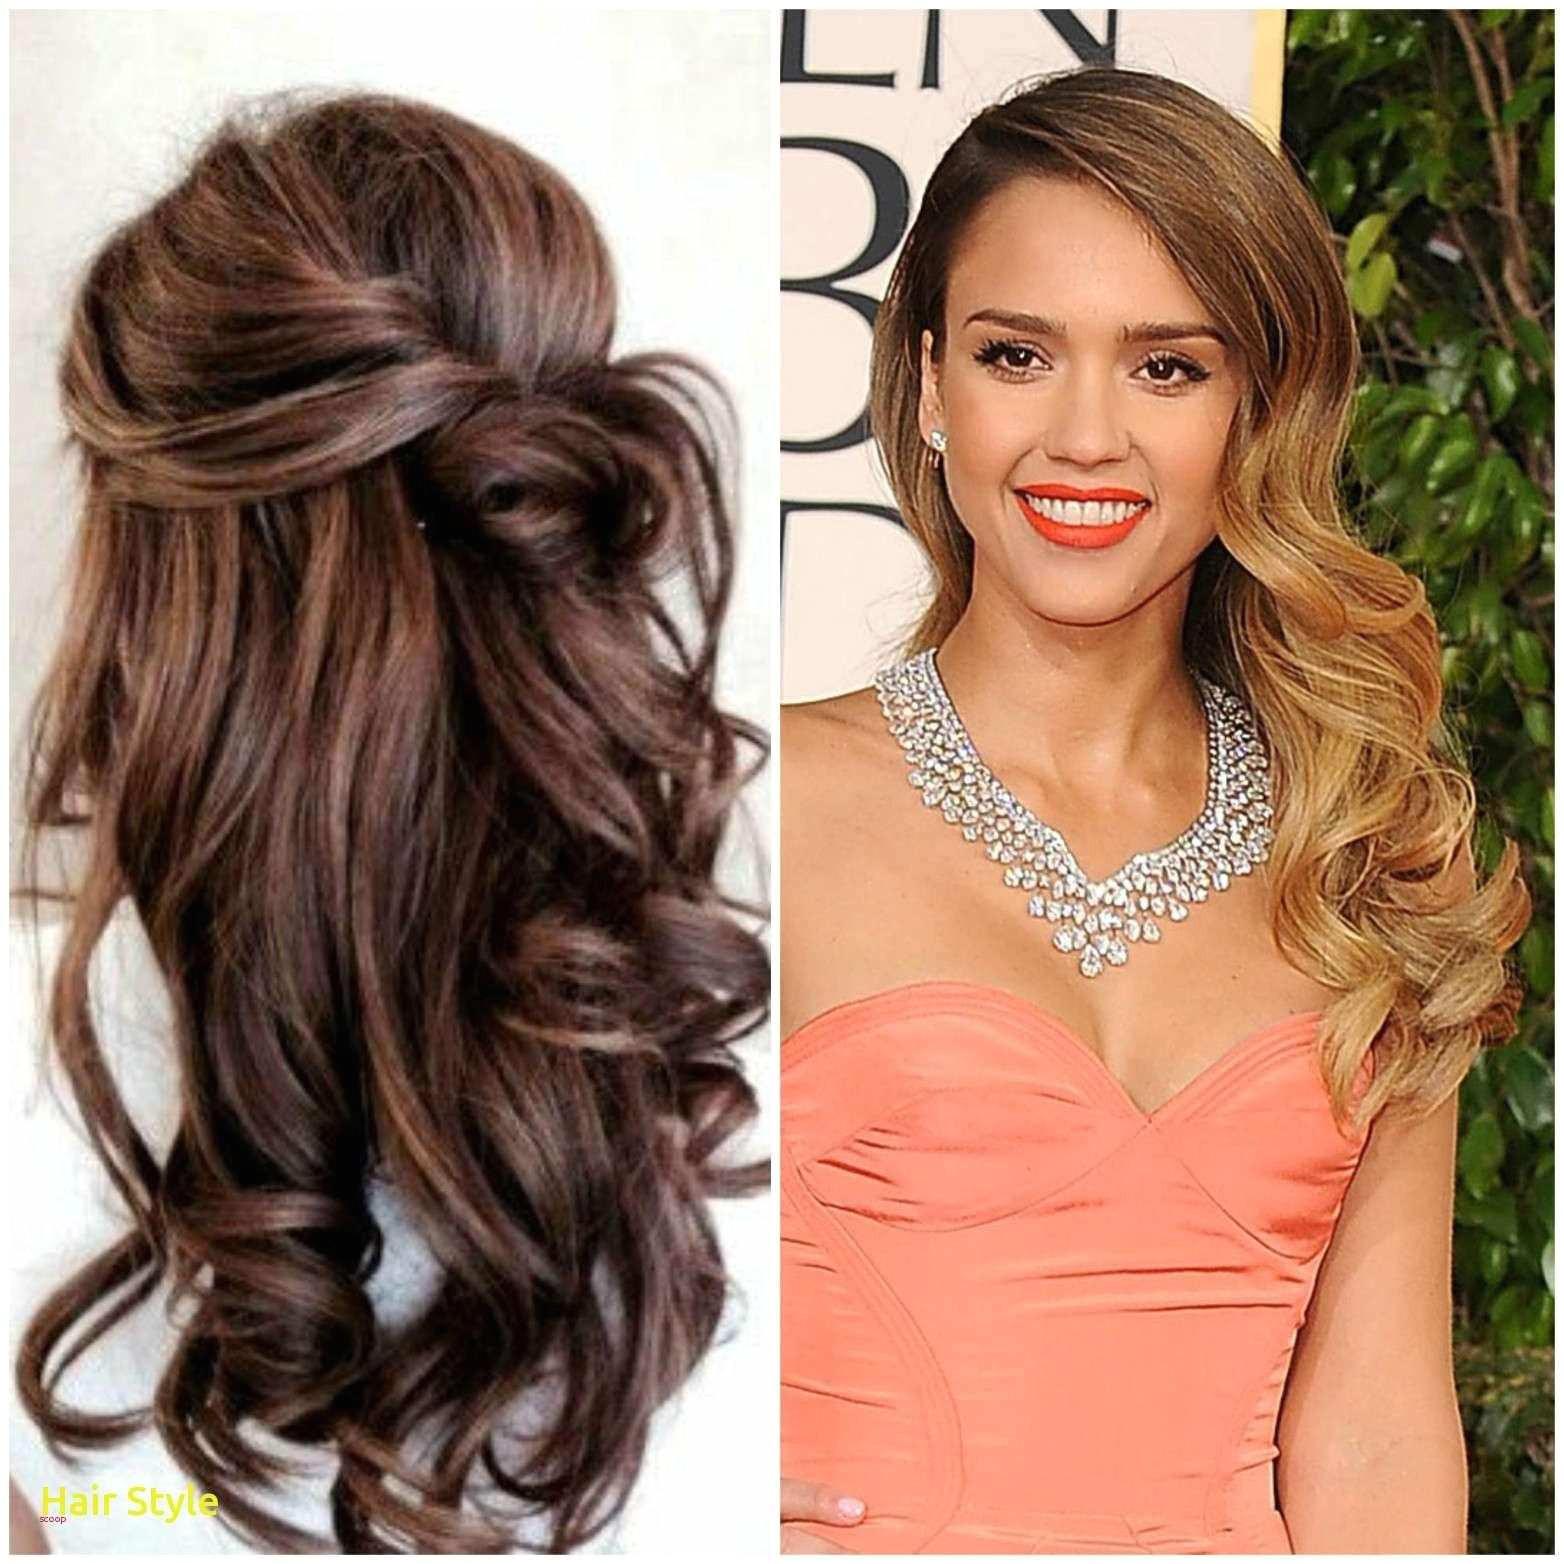 Hairstyles for Long Hair Teenage Girl Beautiful Elegant Haircuts for Long Hair for Teenage Girls Ideas